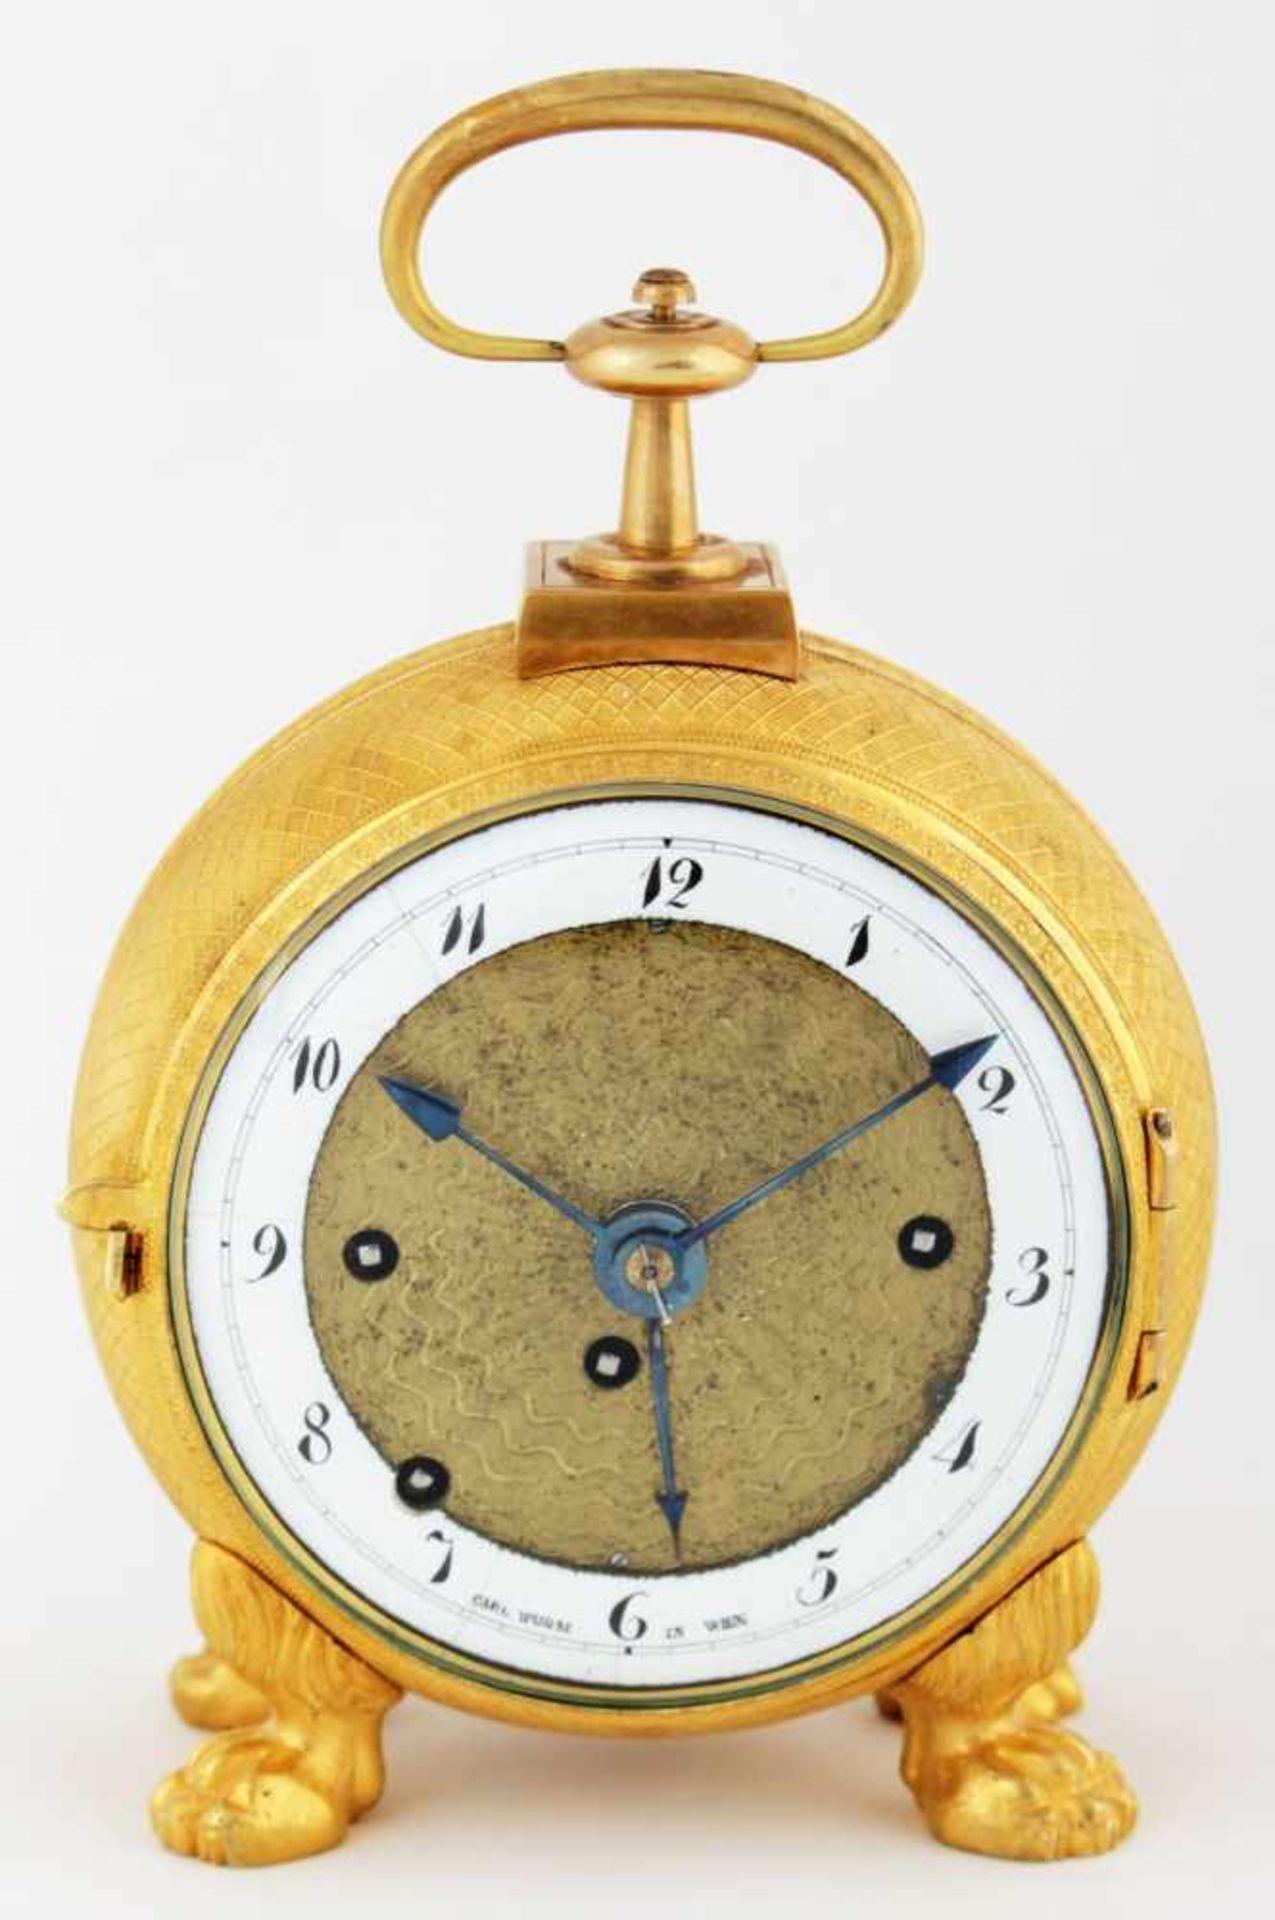 Los 19 - Empire travel clock Carl Wurm in Wien Austria, Vienna, circa 1820, travel clock with alarm, enameled